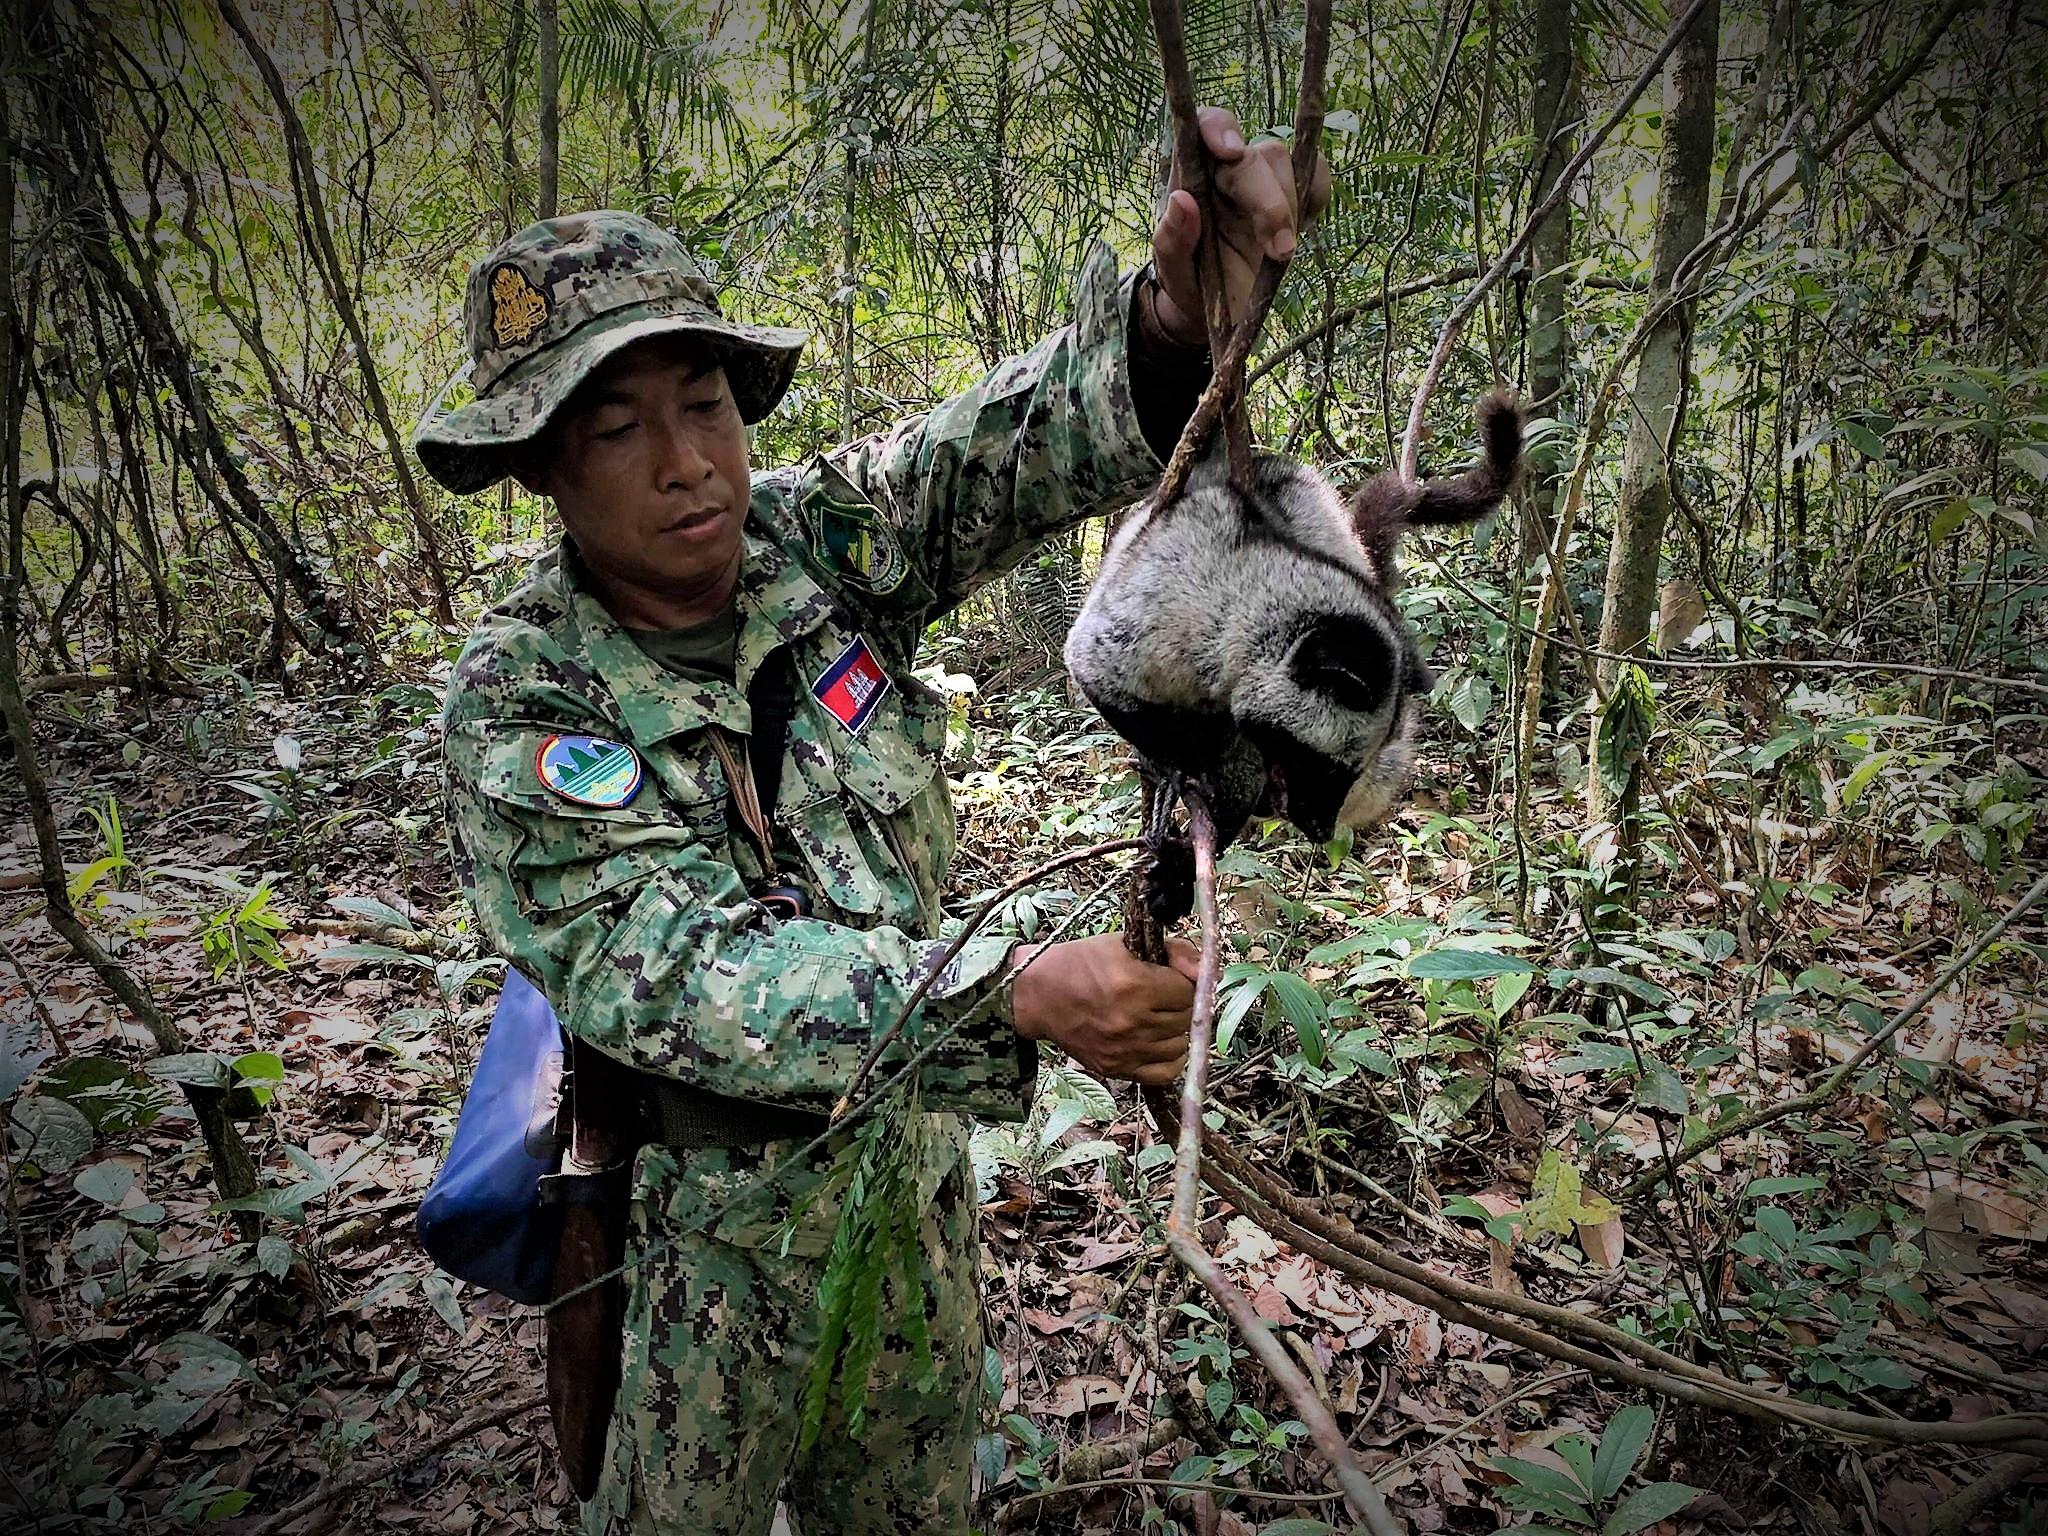 kopi luwak Civet rescued from the Kopi Luwak coffee industry Civet trapped for Kopi Luwak coffee